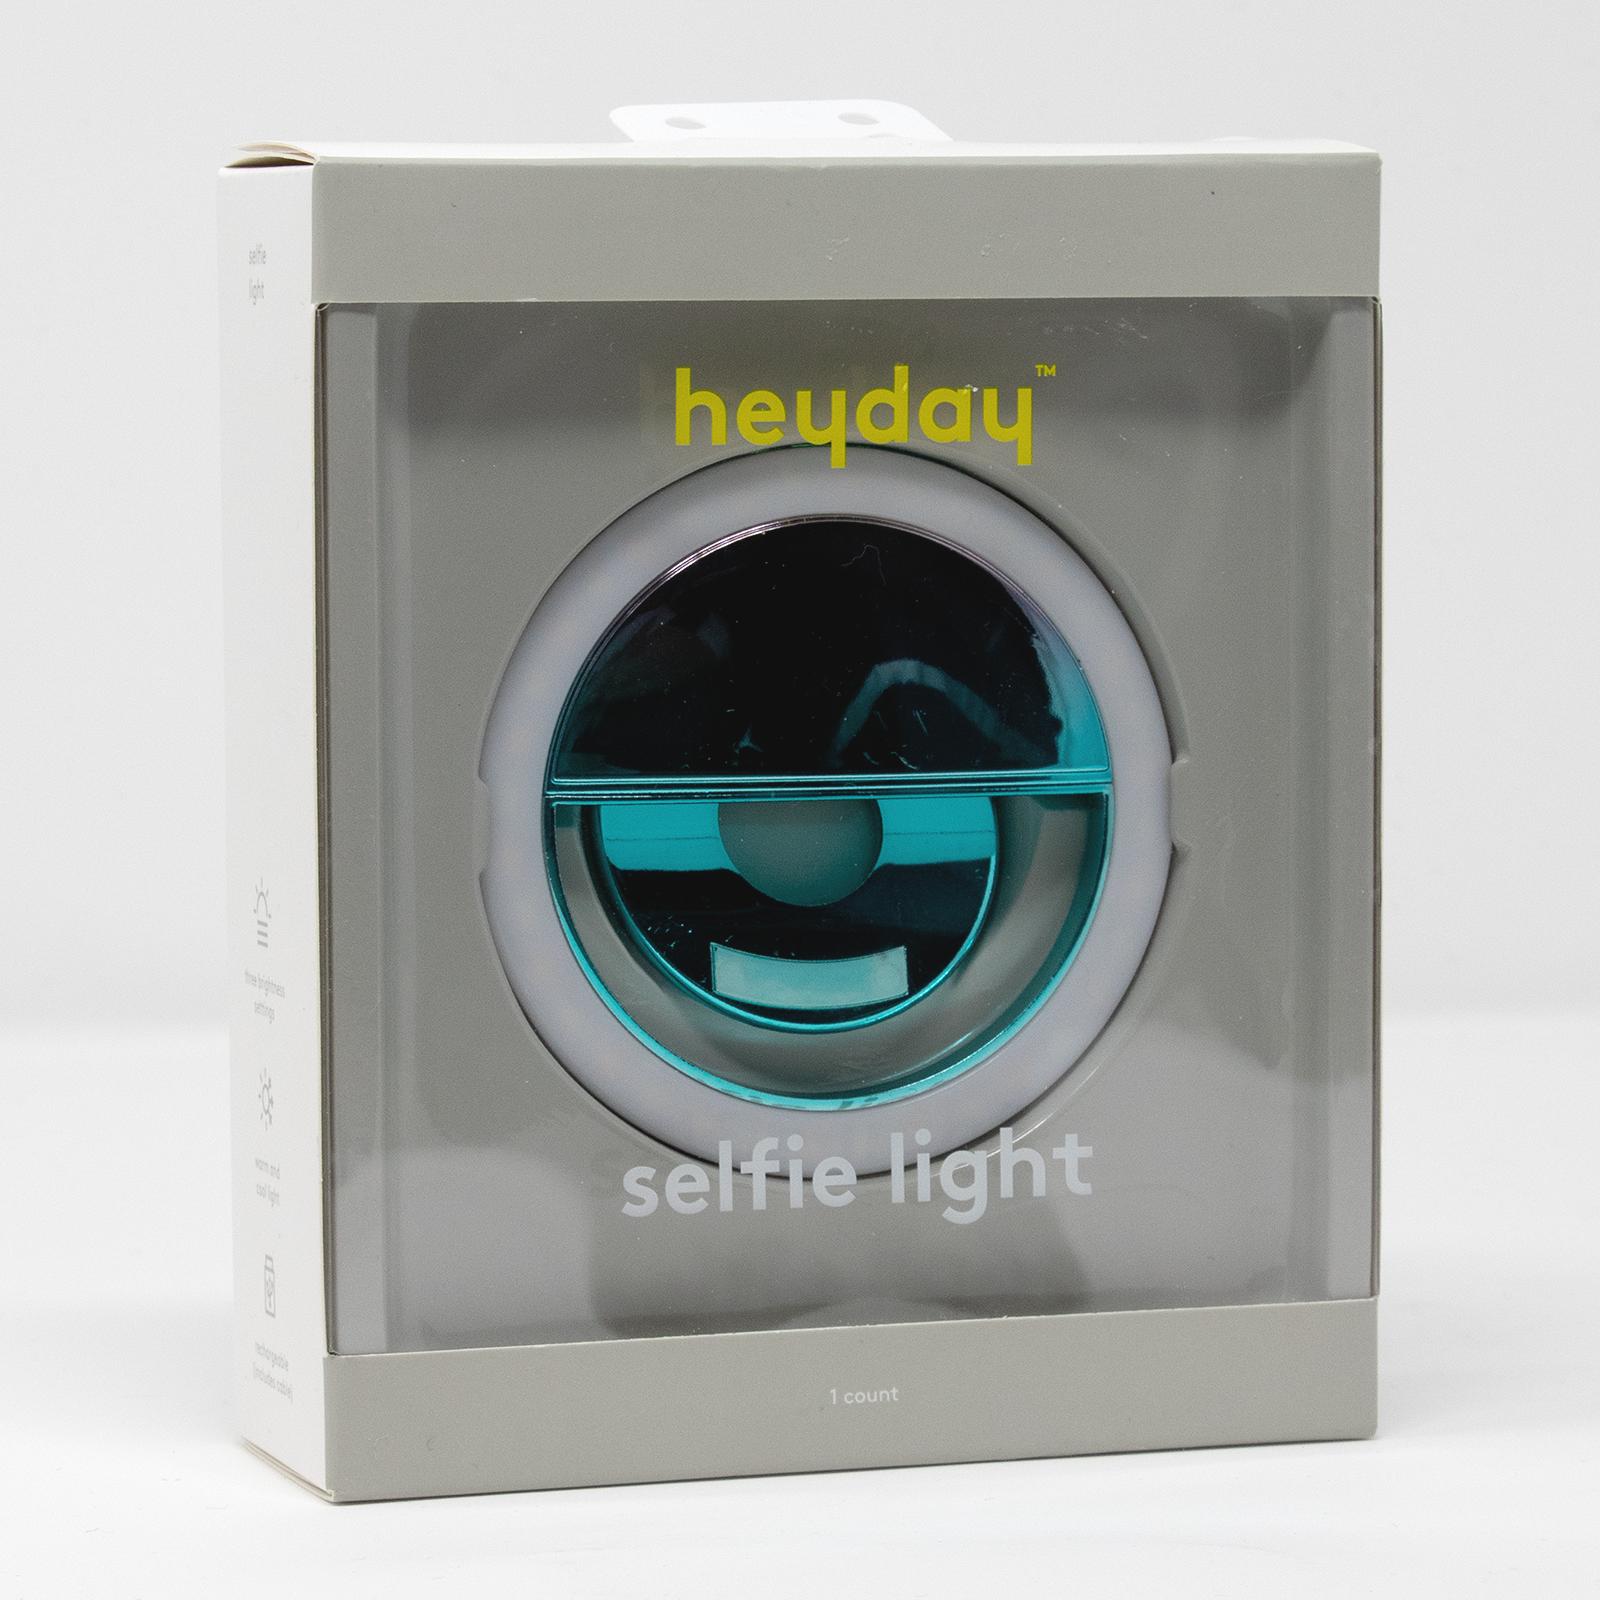 Heyday Universal Cell Phone Selfie Light - Iridescent/Teal